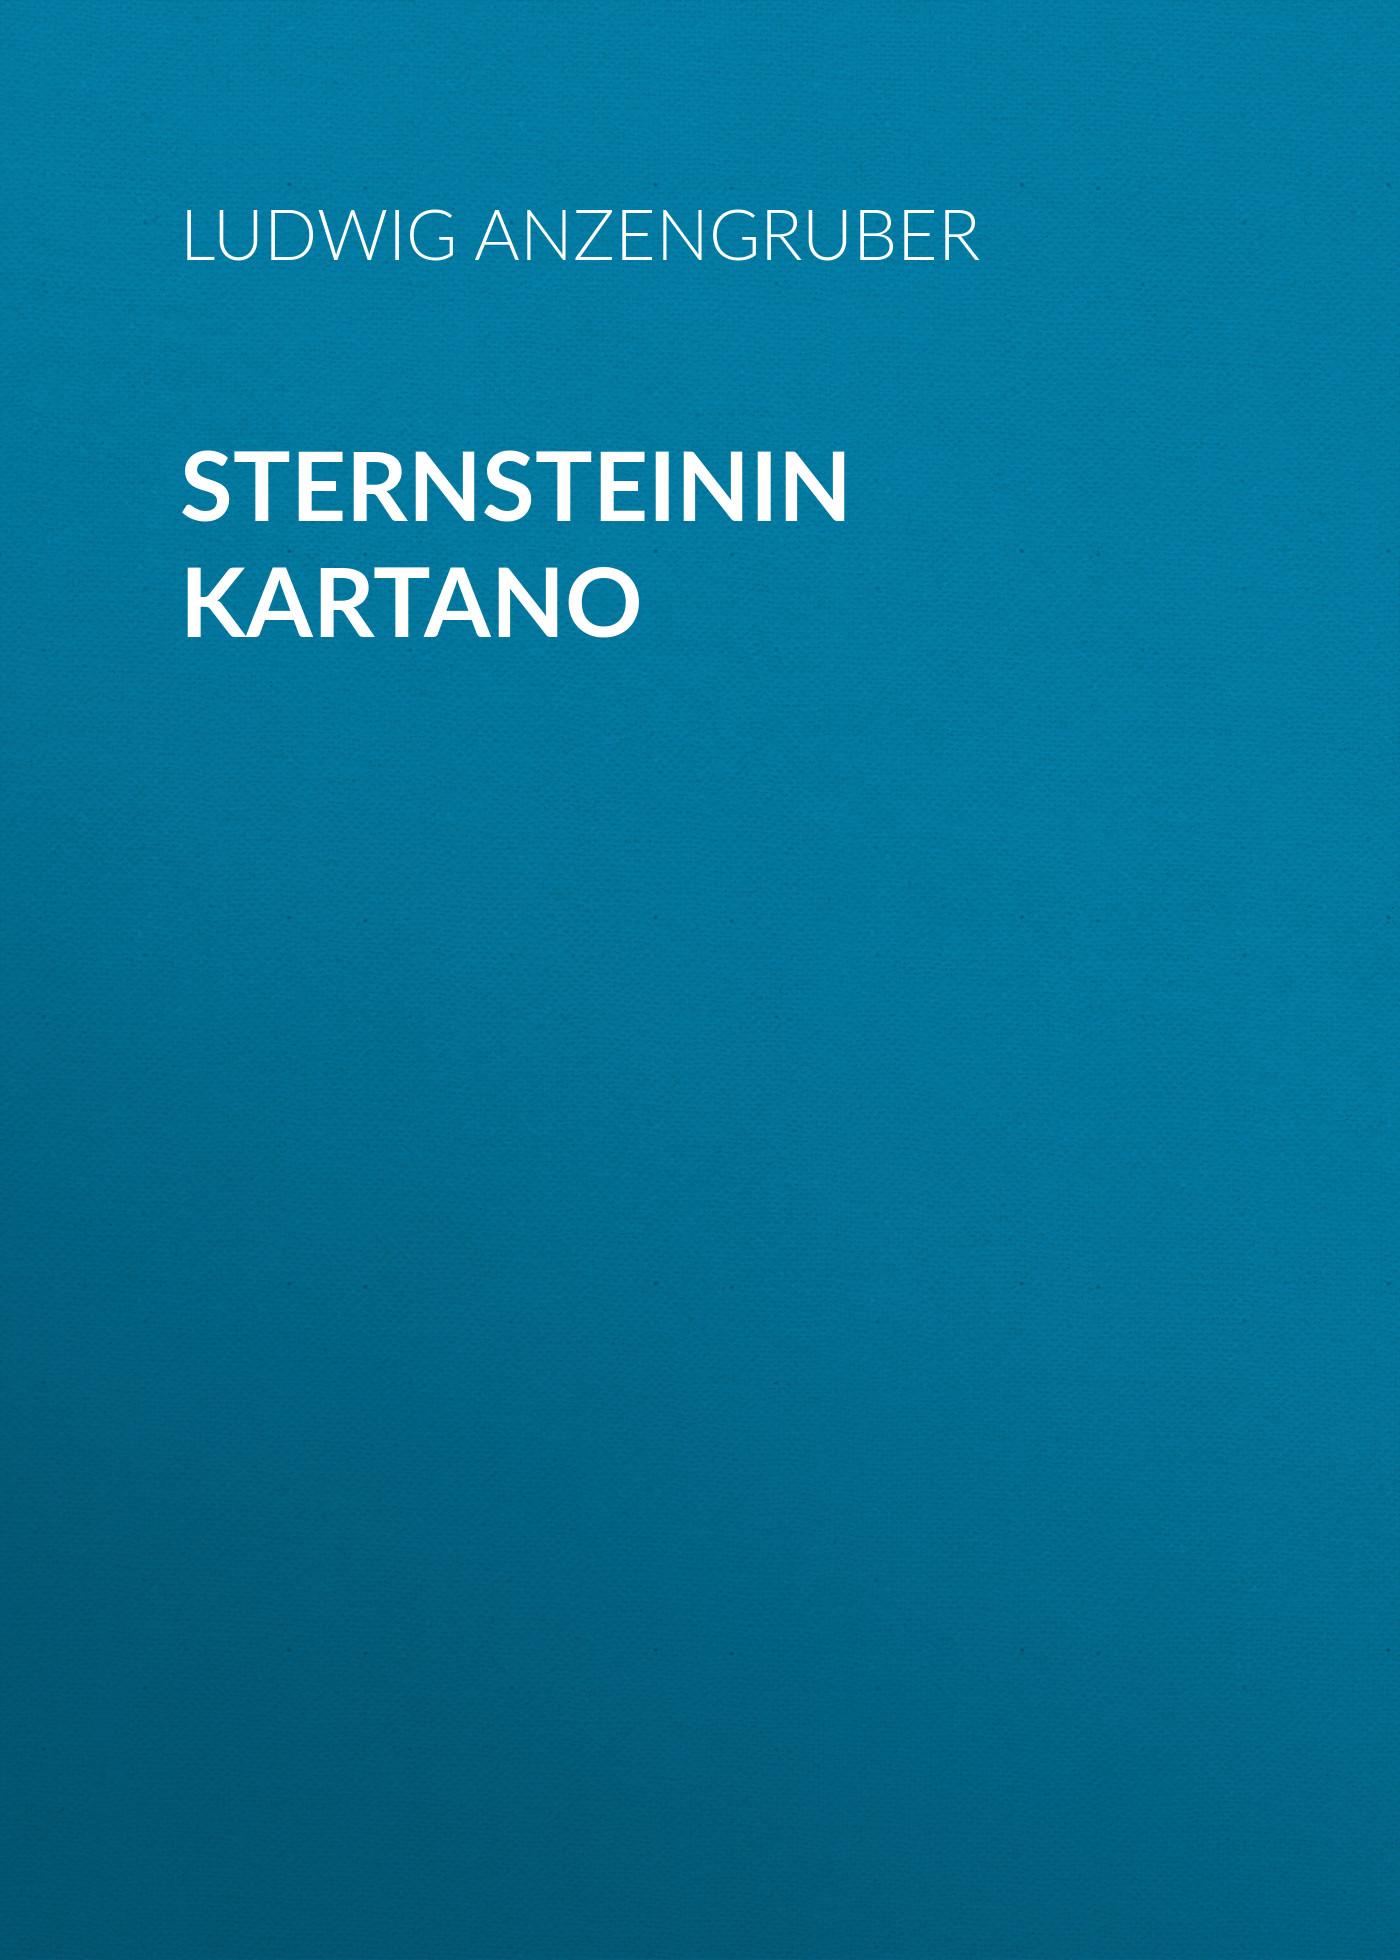 цена Anzengruber Ludwig Sternsteinin kartano онлайн в 2017 году